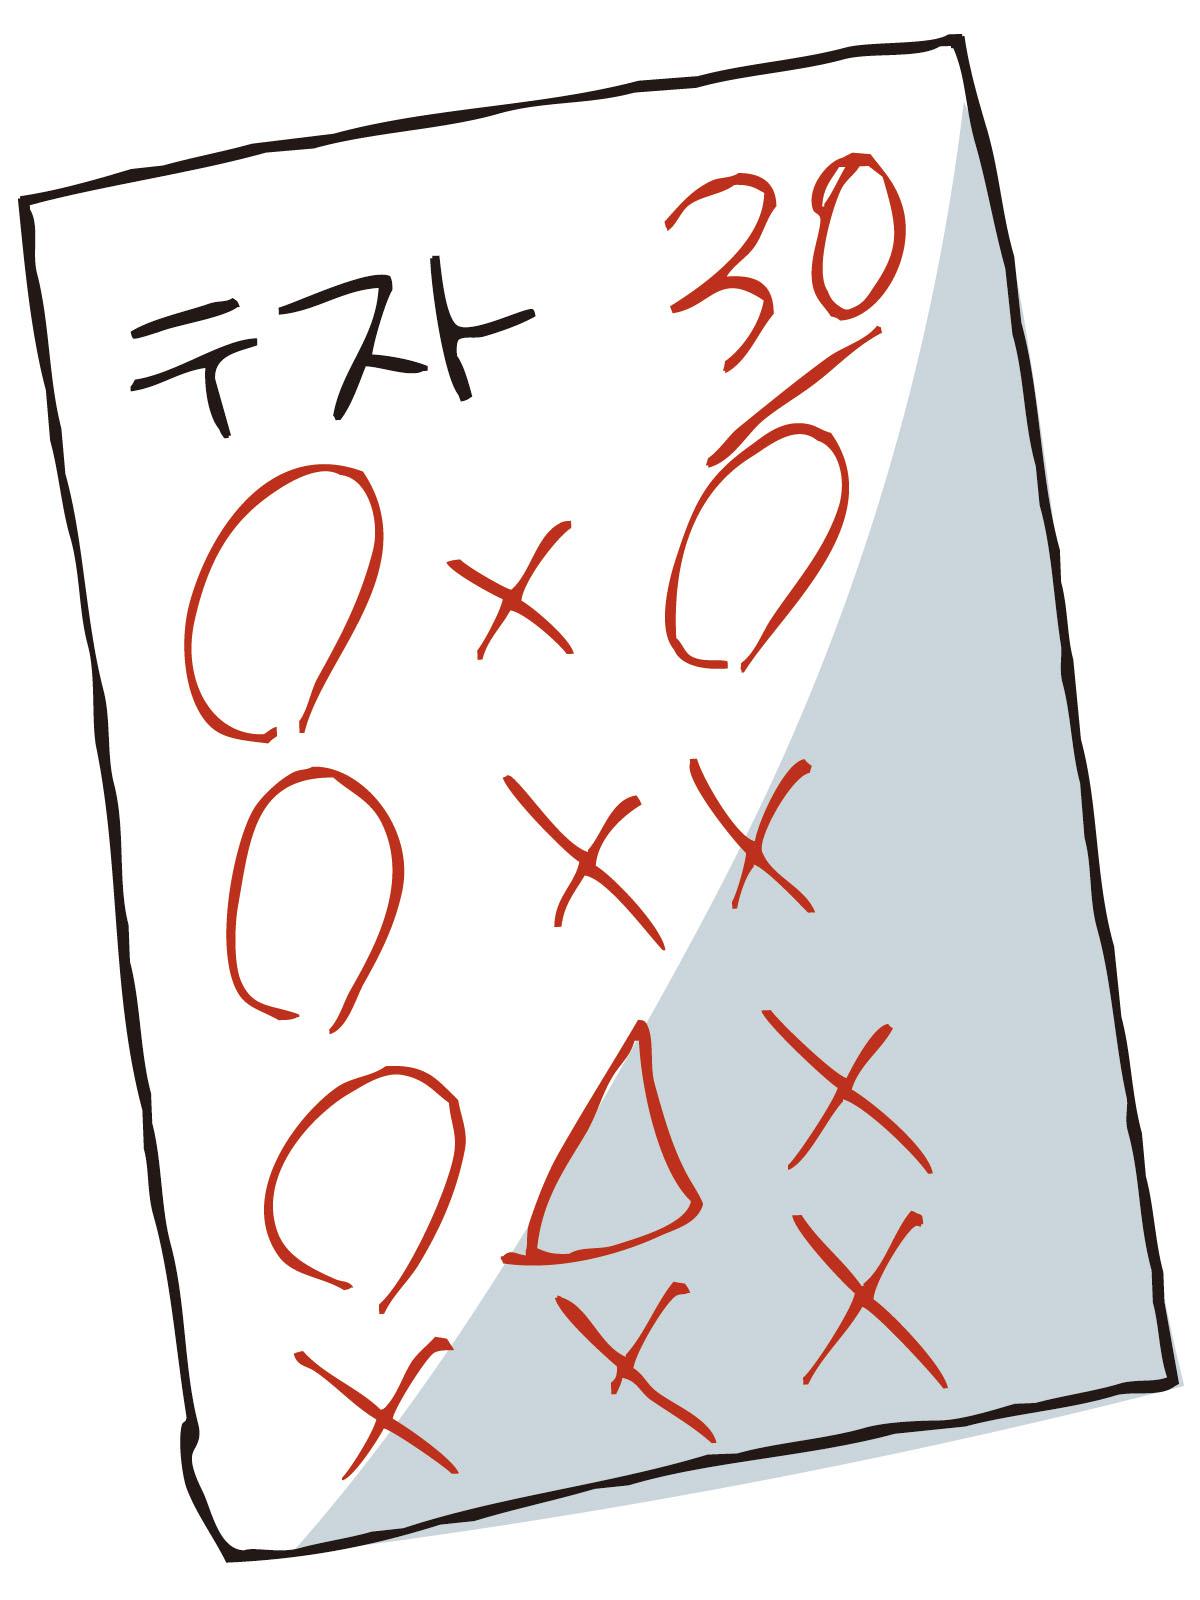 ... 理由 | 中学生の勉強法ガイド : 中学生 英語 問題集 : 中学